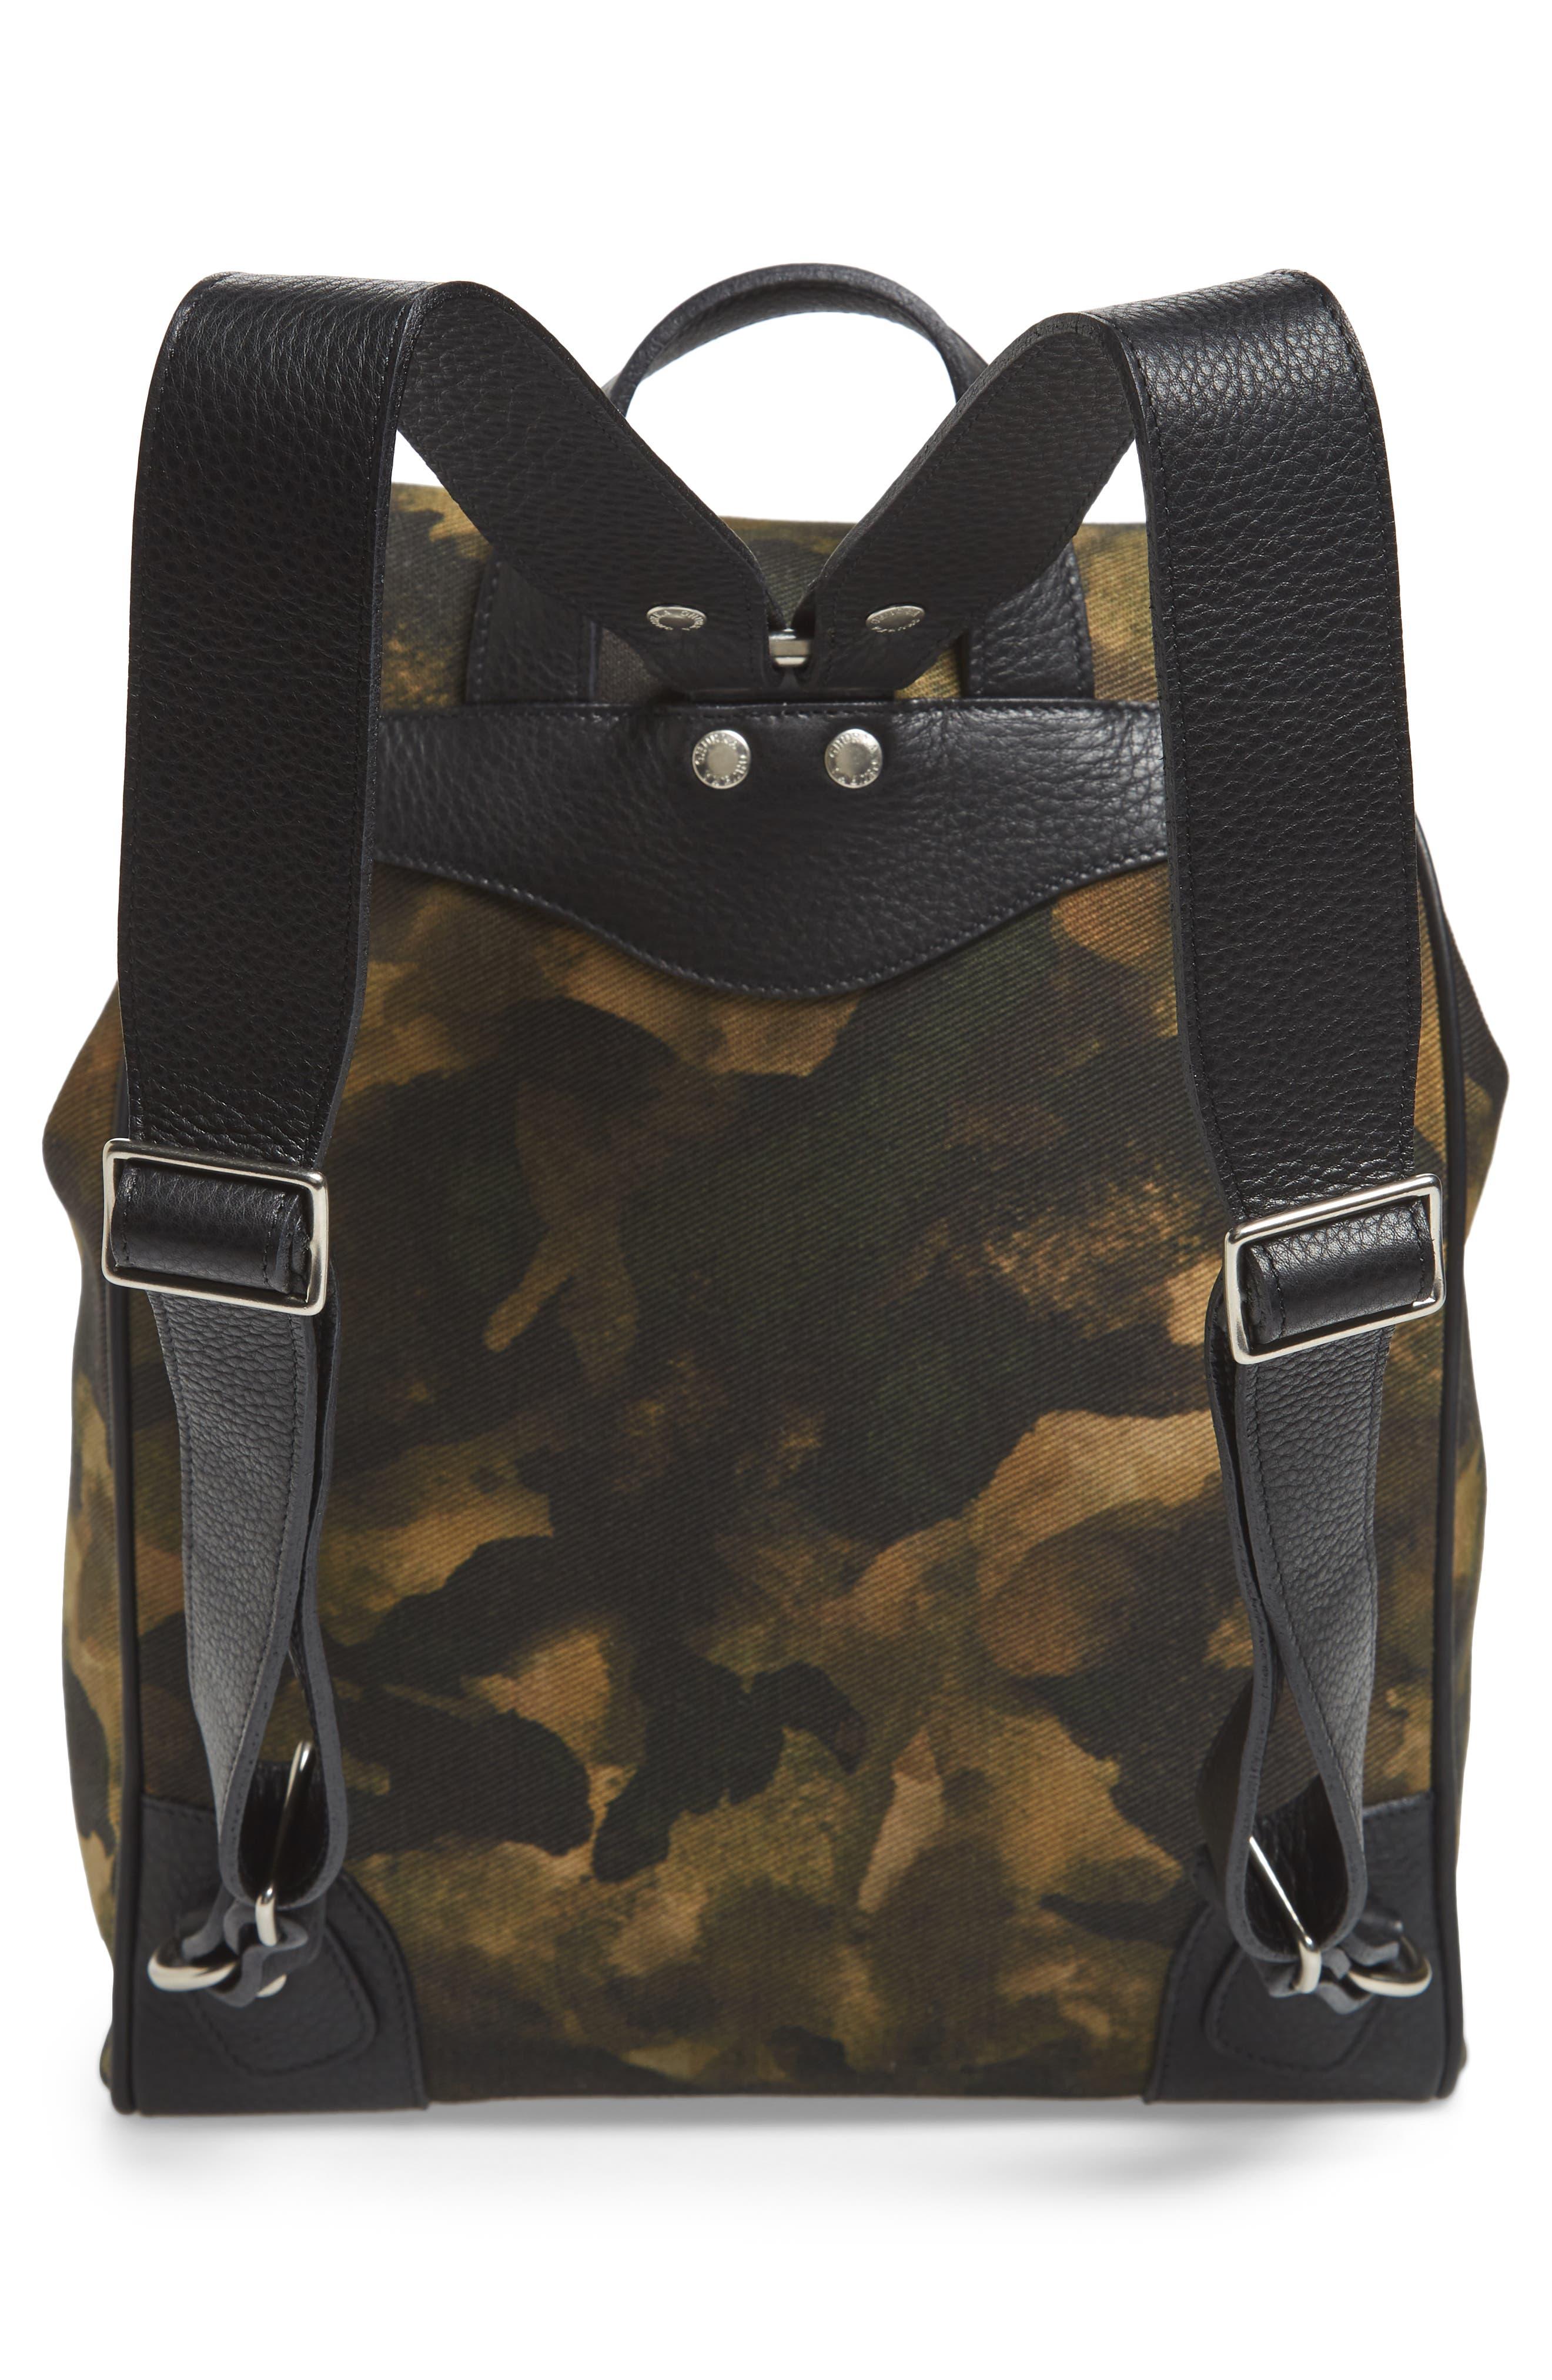 Blazer Canvas Backpack,                             Alternate thumbnail 3, color,                             350